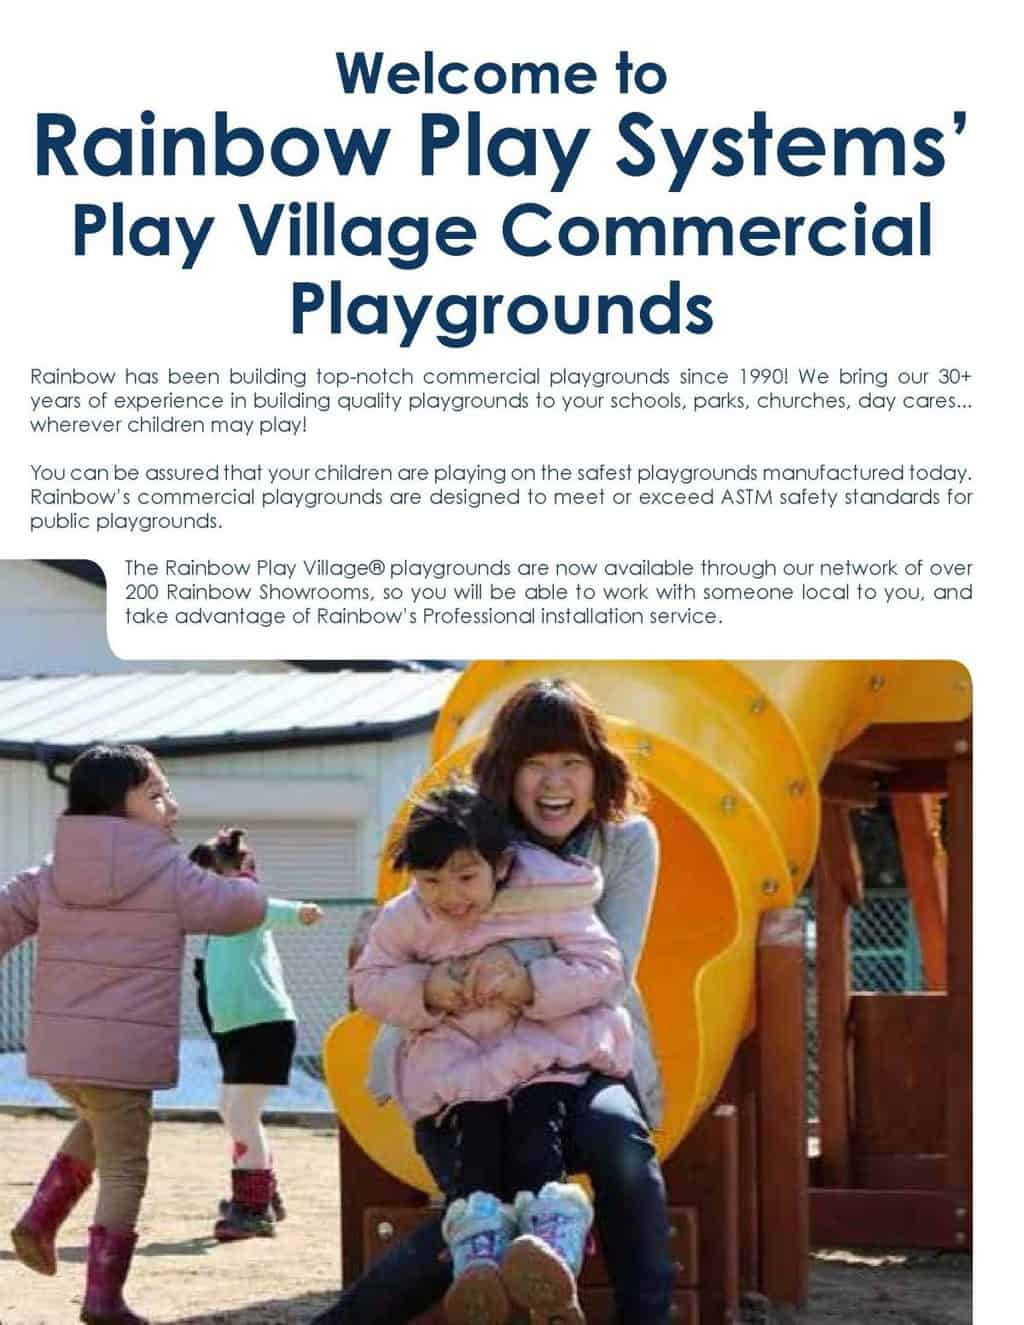 Rainbow Play Village Design 302 (18)